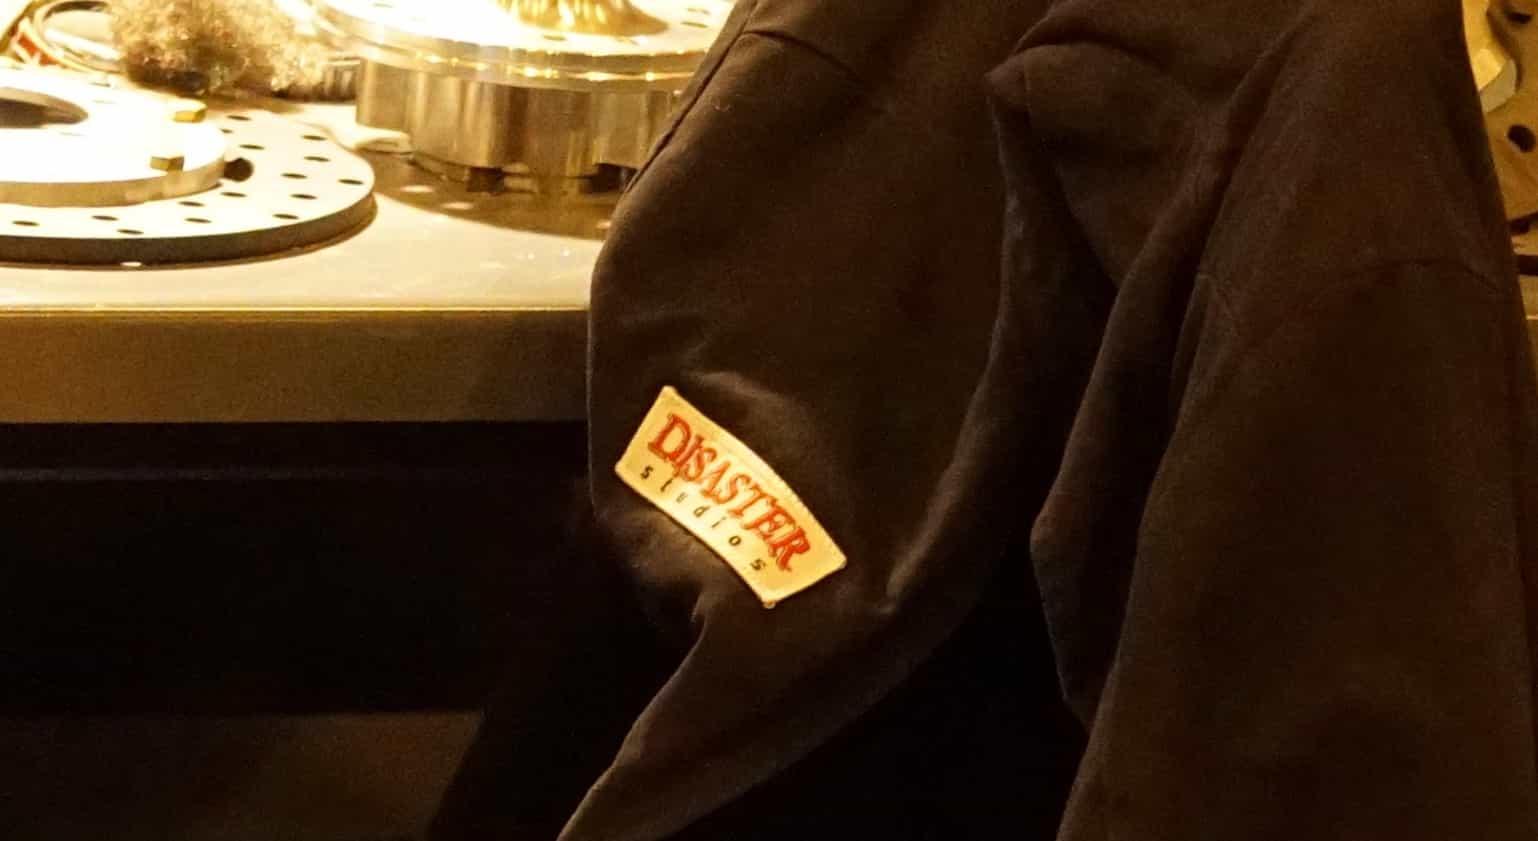 Disaster jacket